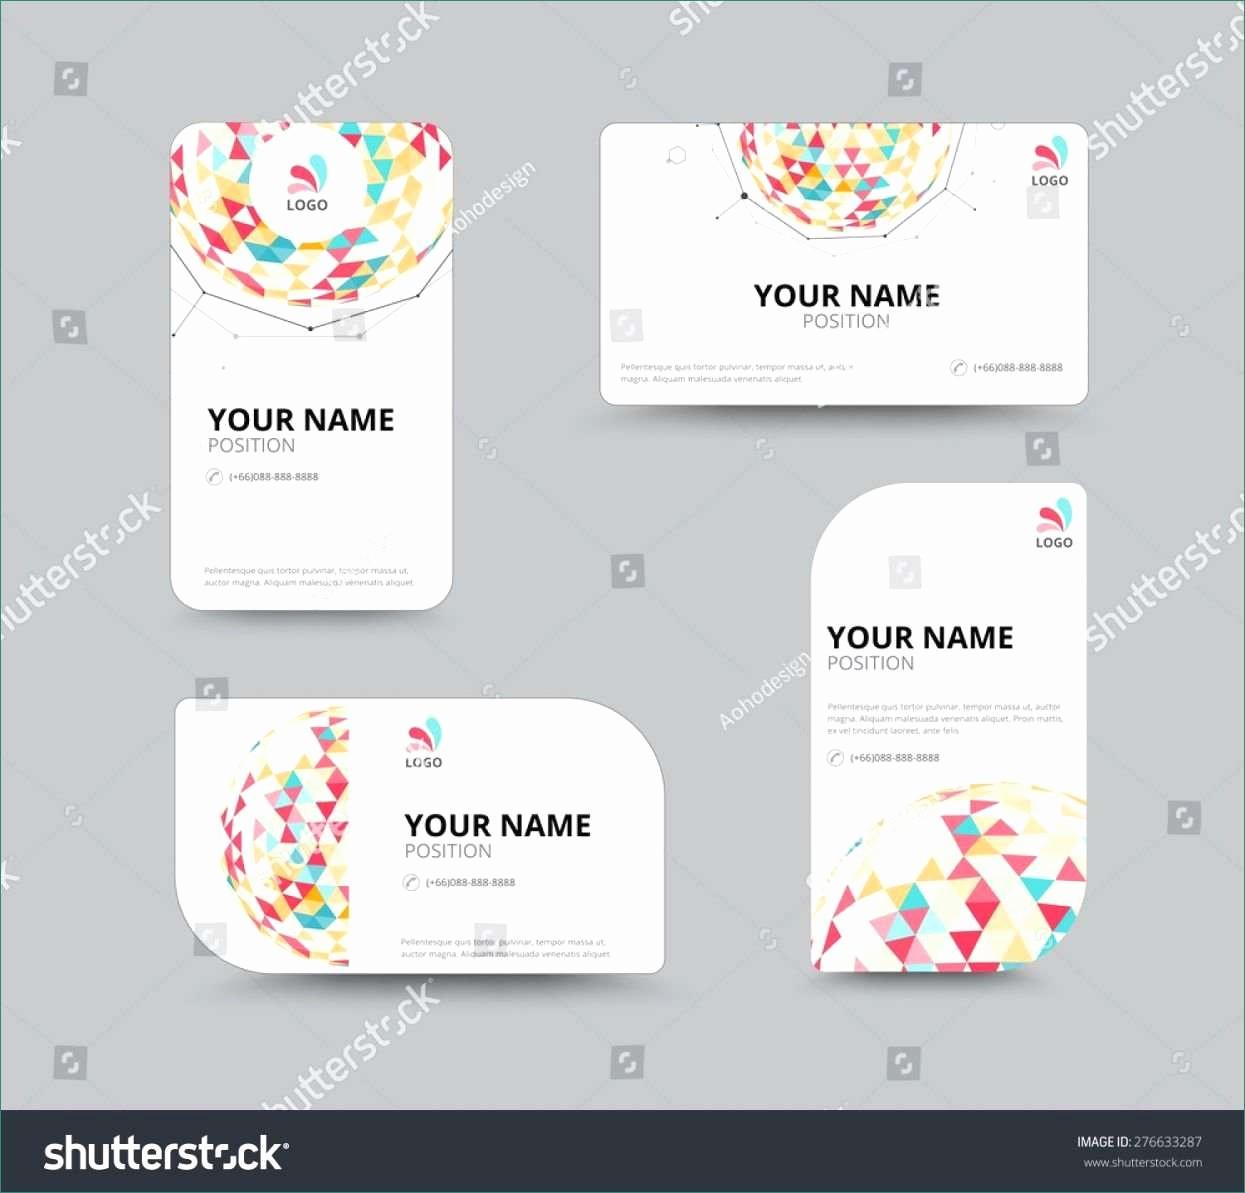 Microsoft Business Card Templates Free Unique Microsoft Publisher Business Card Templates Image